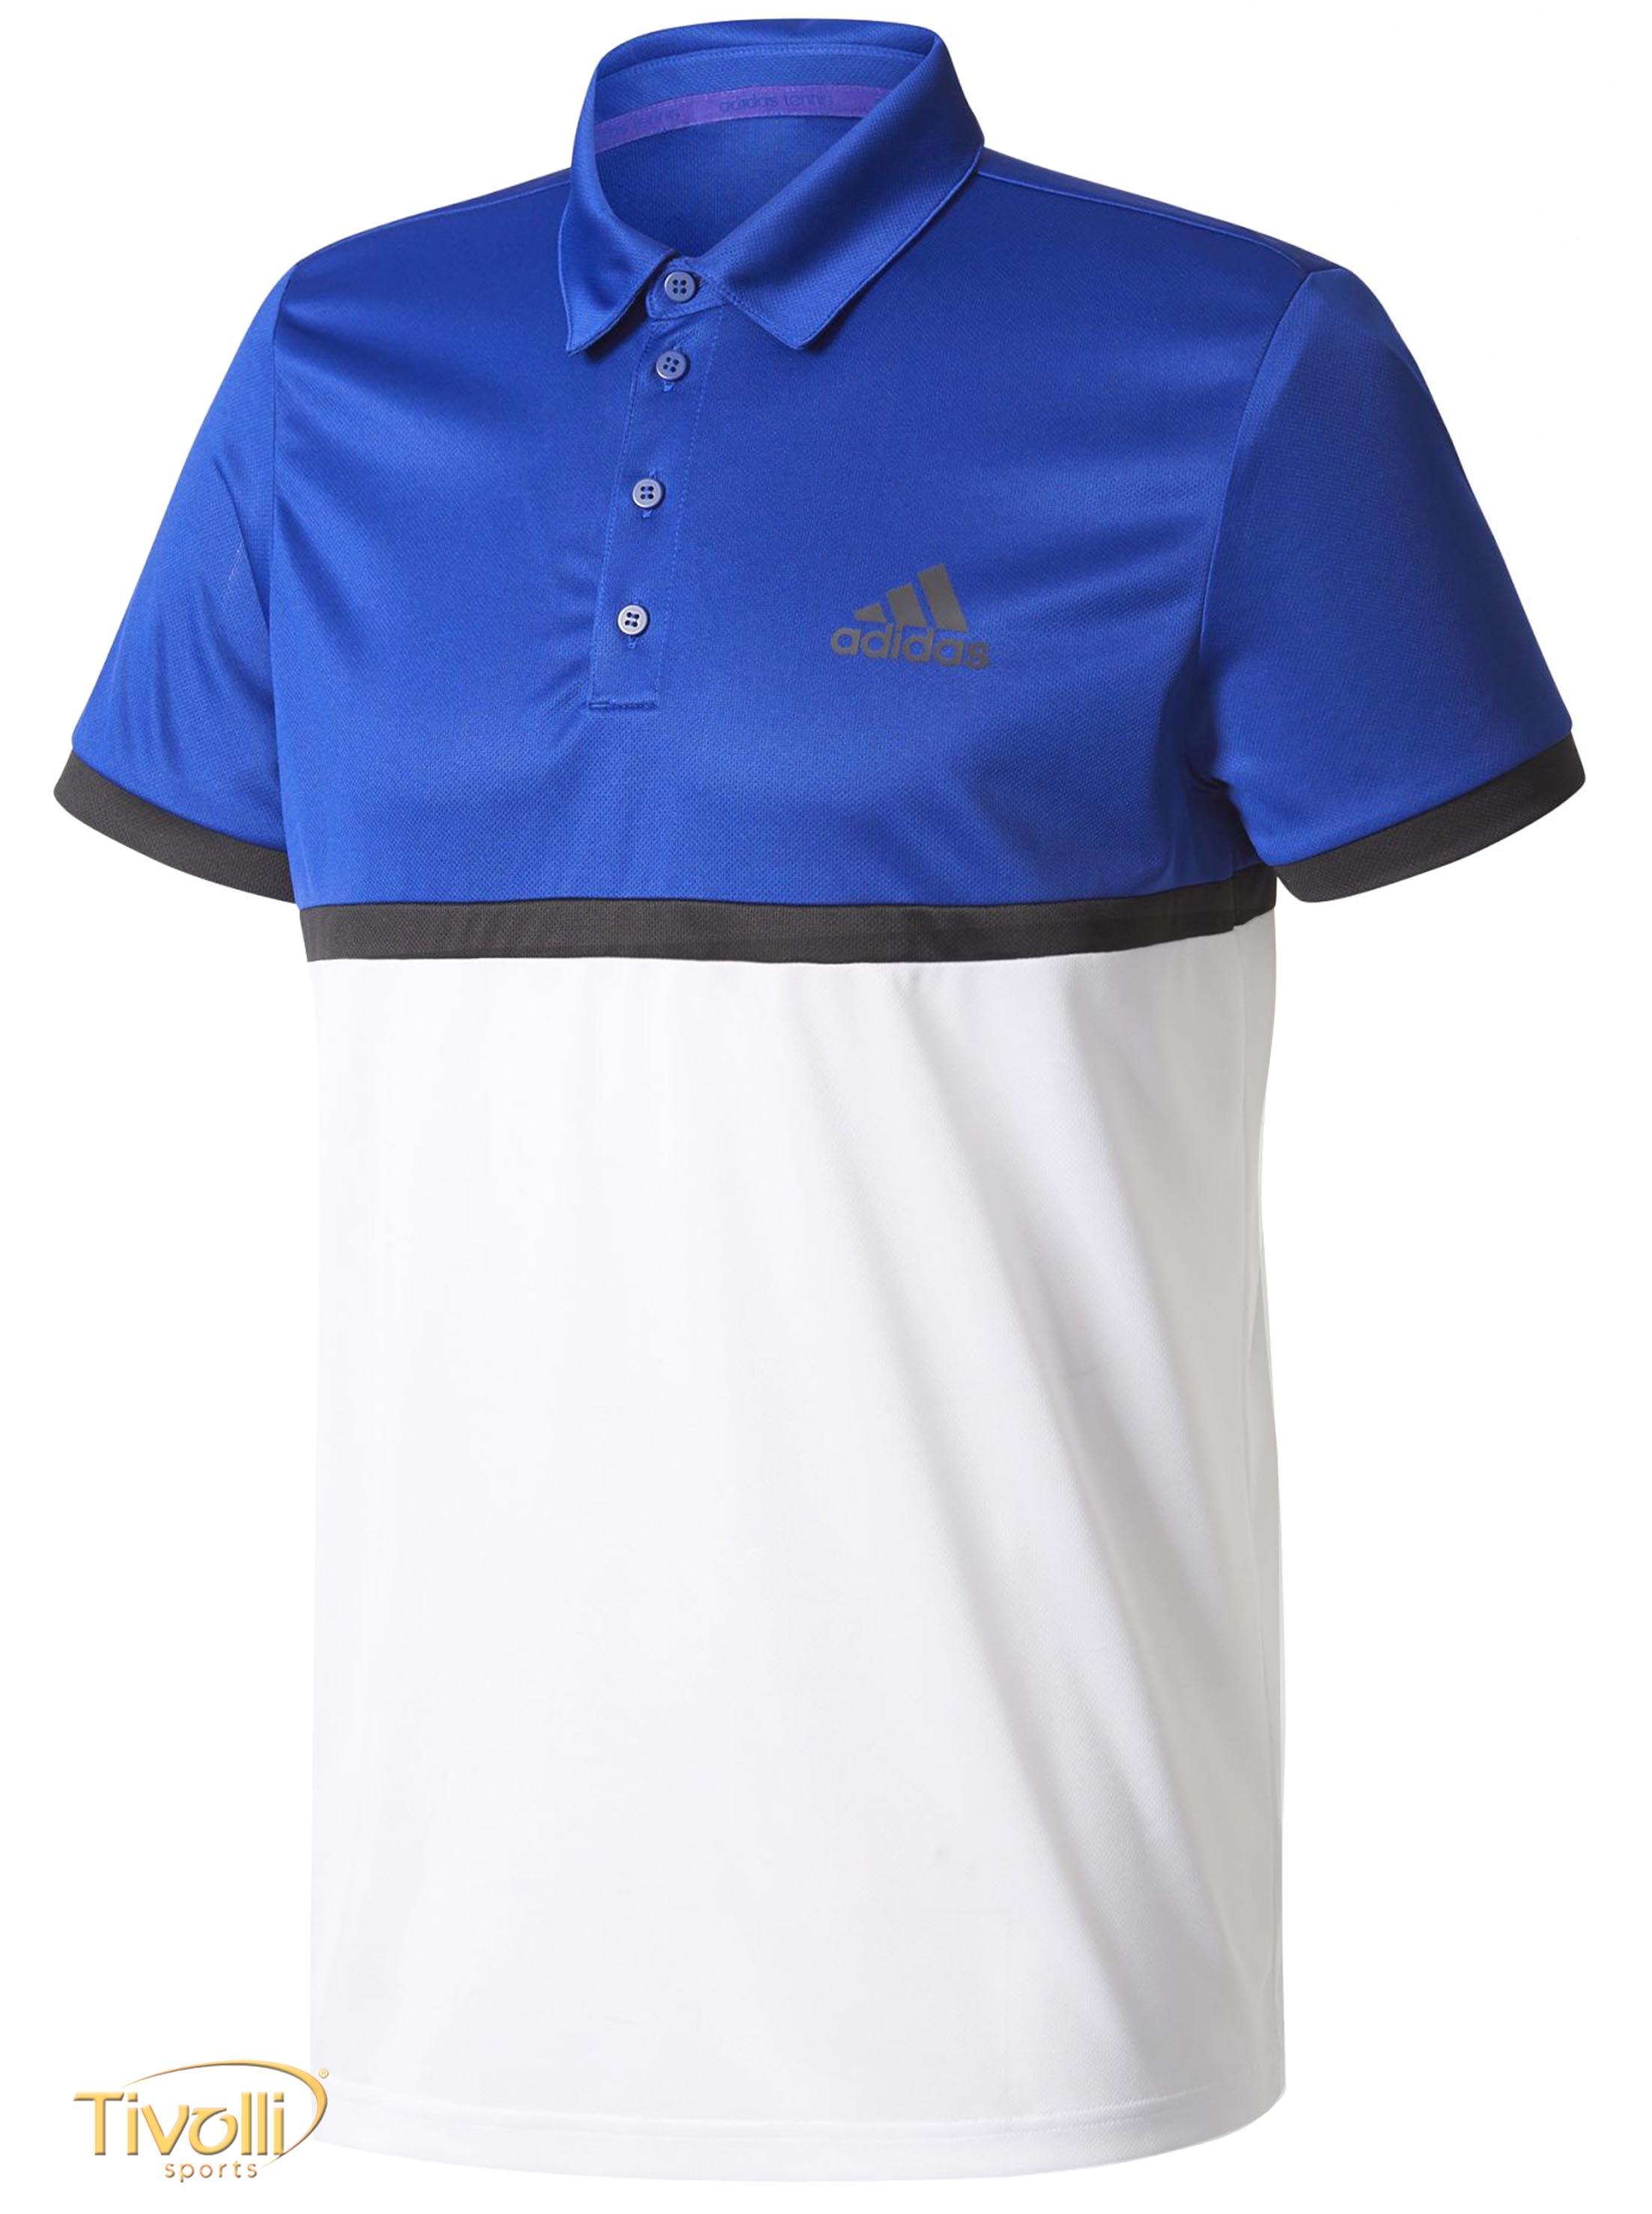 bff1712b53 Raquete Mania   Camisa Polo Adidas Court   Azul